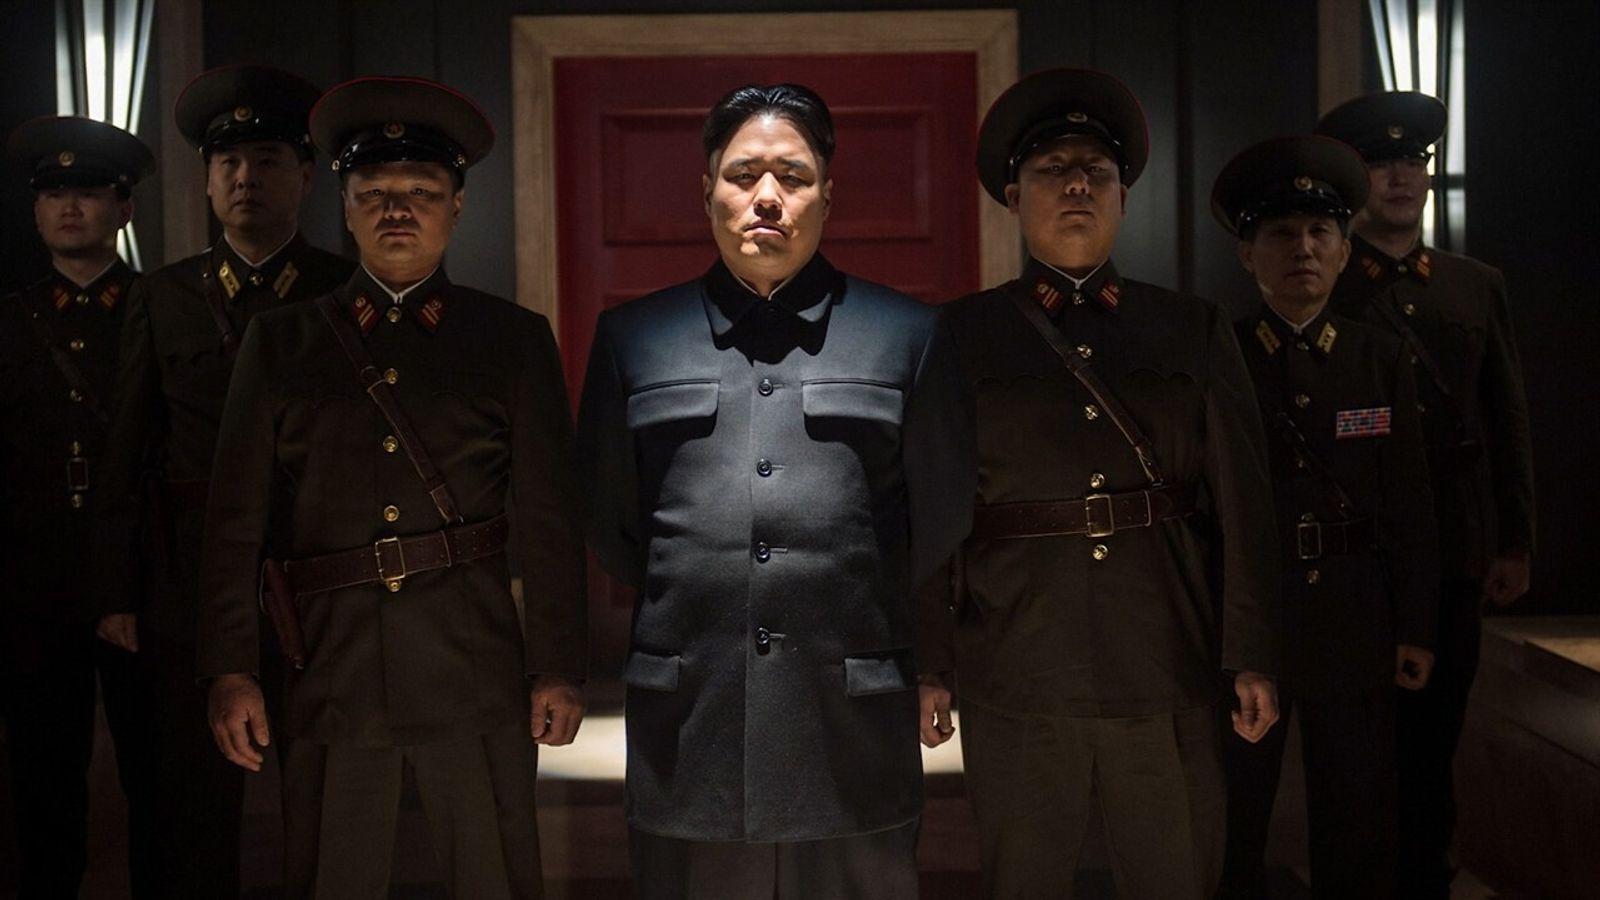 El ciberataque a Sony Pictures de 2014